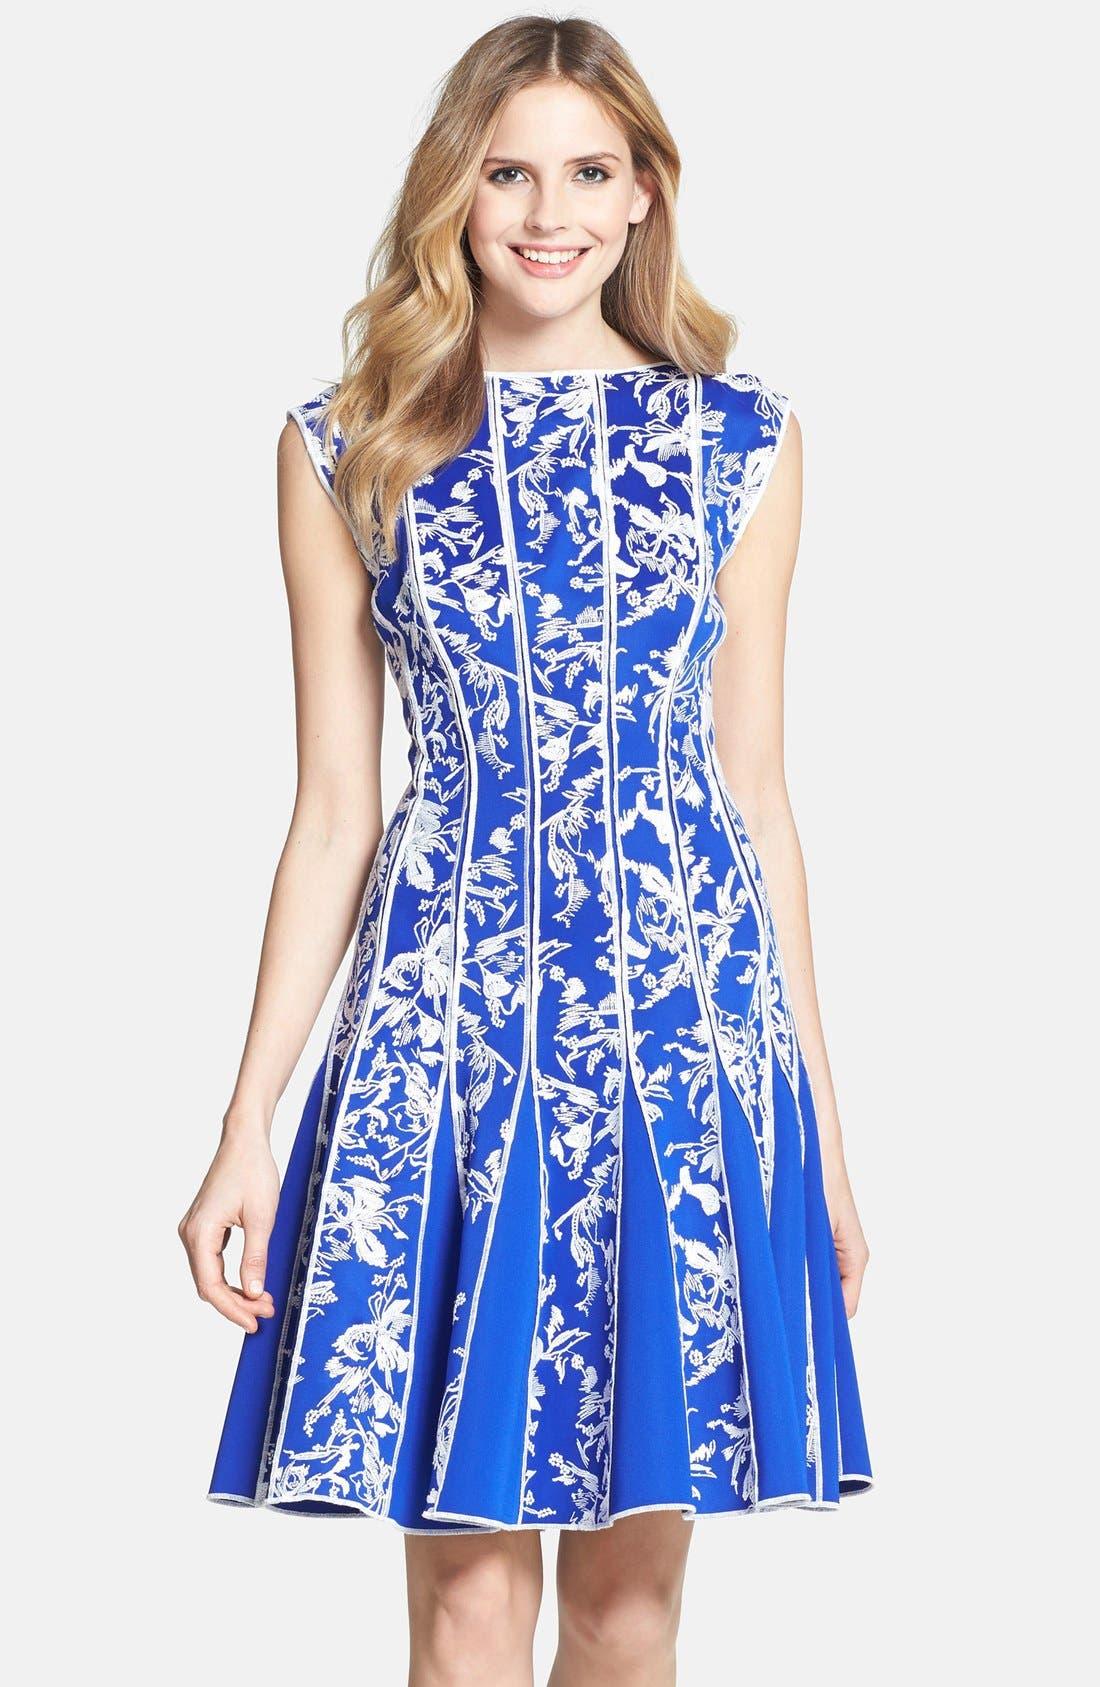 Main Image - Tadashi Shoji Embroidered Neoprene Fit & Flare Dress